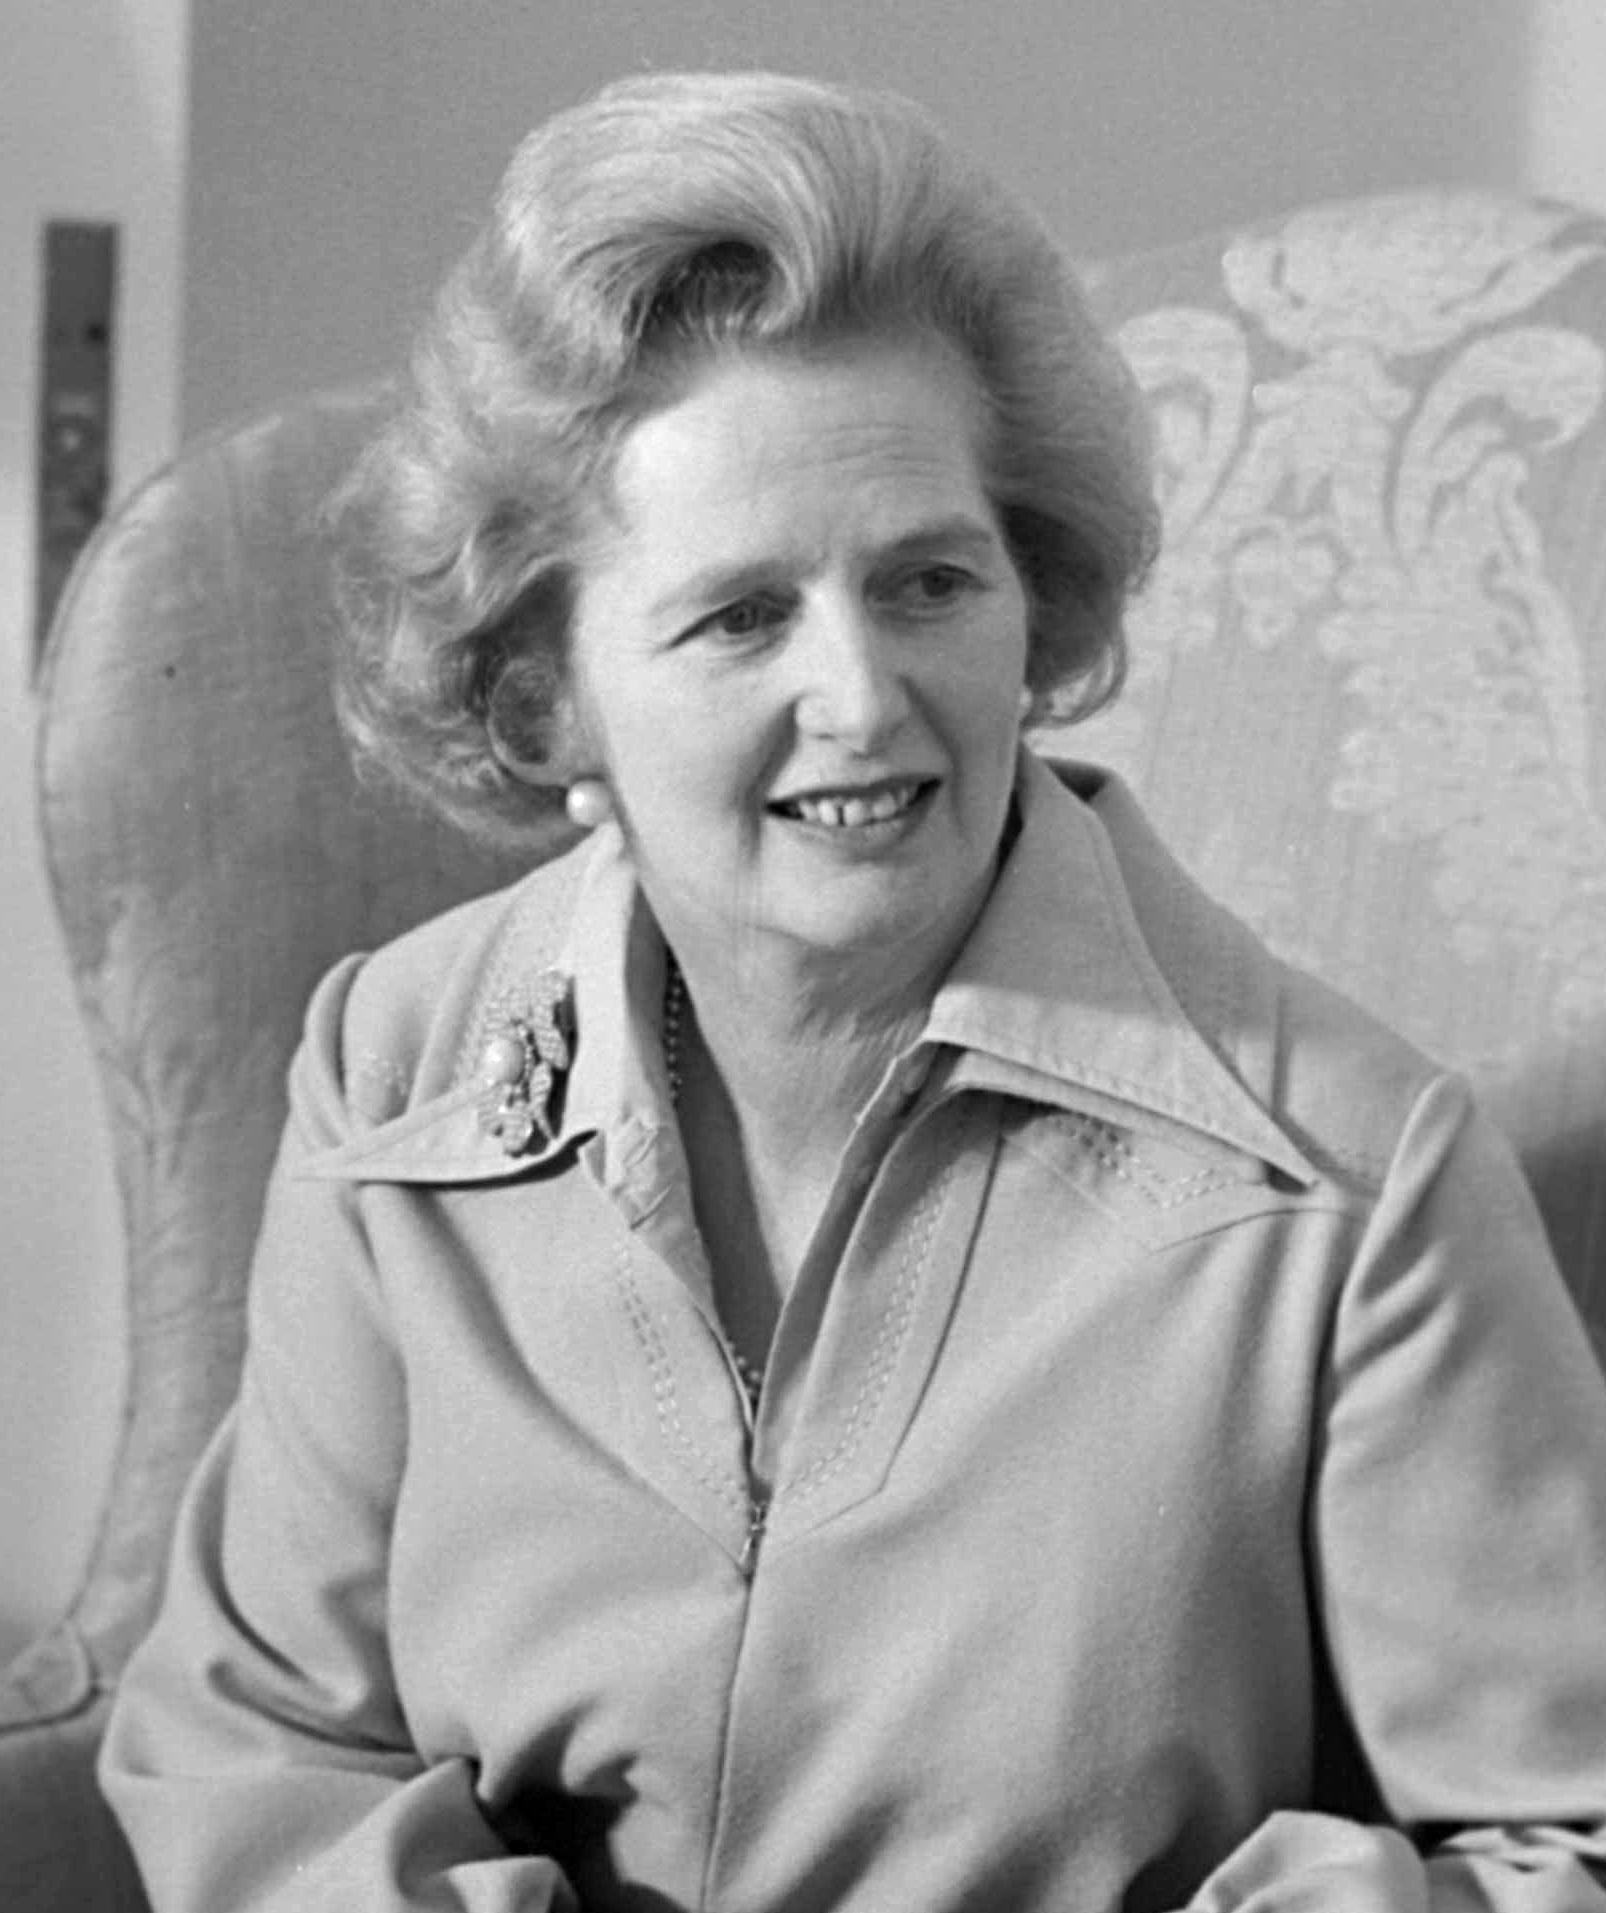 http://upload.wikimedia.org/wikipedia/commons/f/ff/Thatcher-loc.jpg